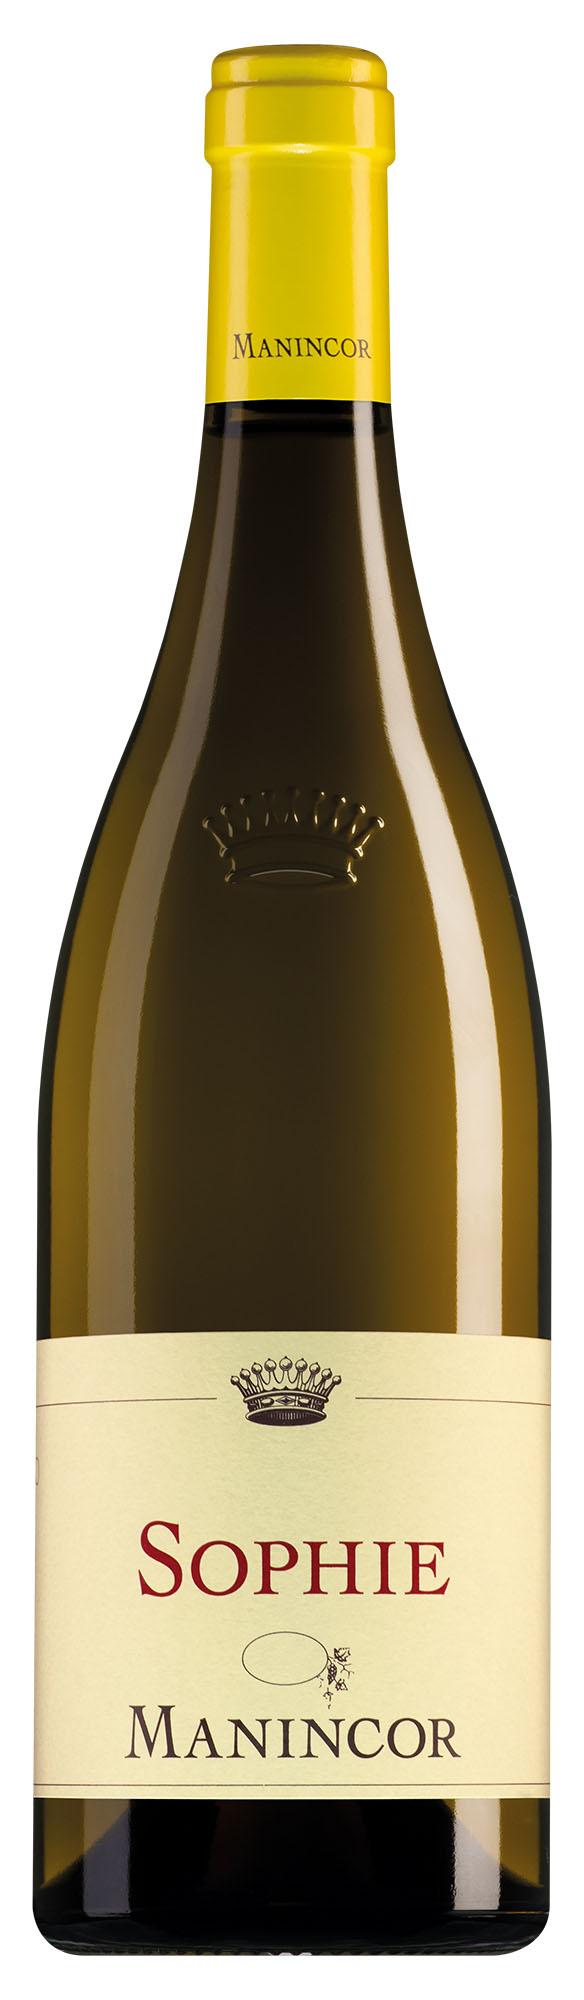 Manincor Alto Adige Terlano Sophie Chardonnay